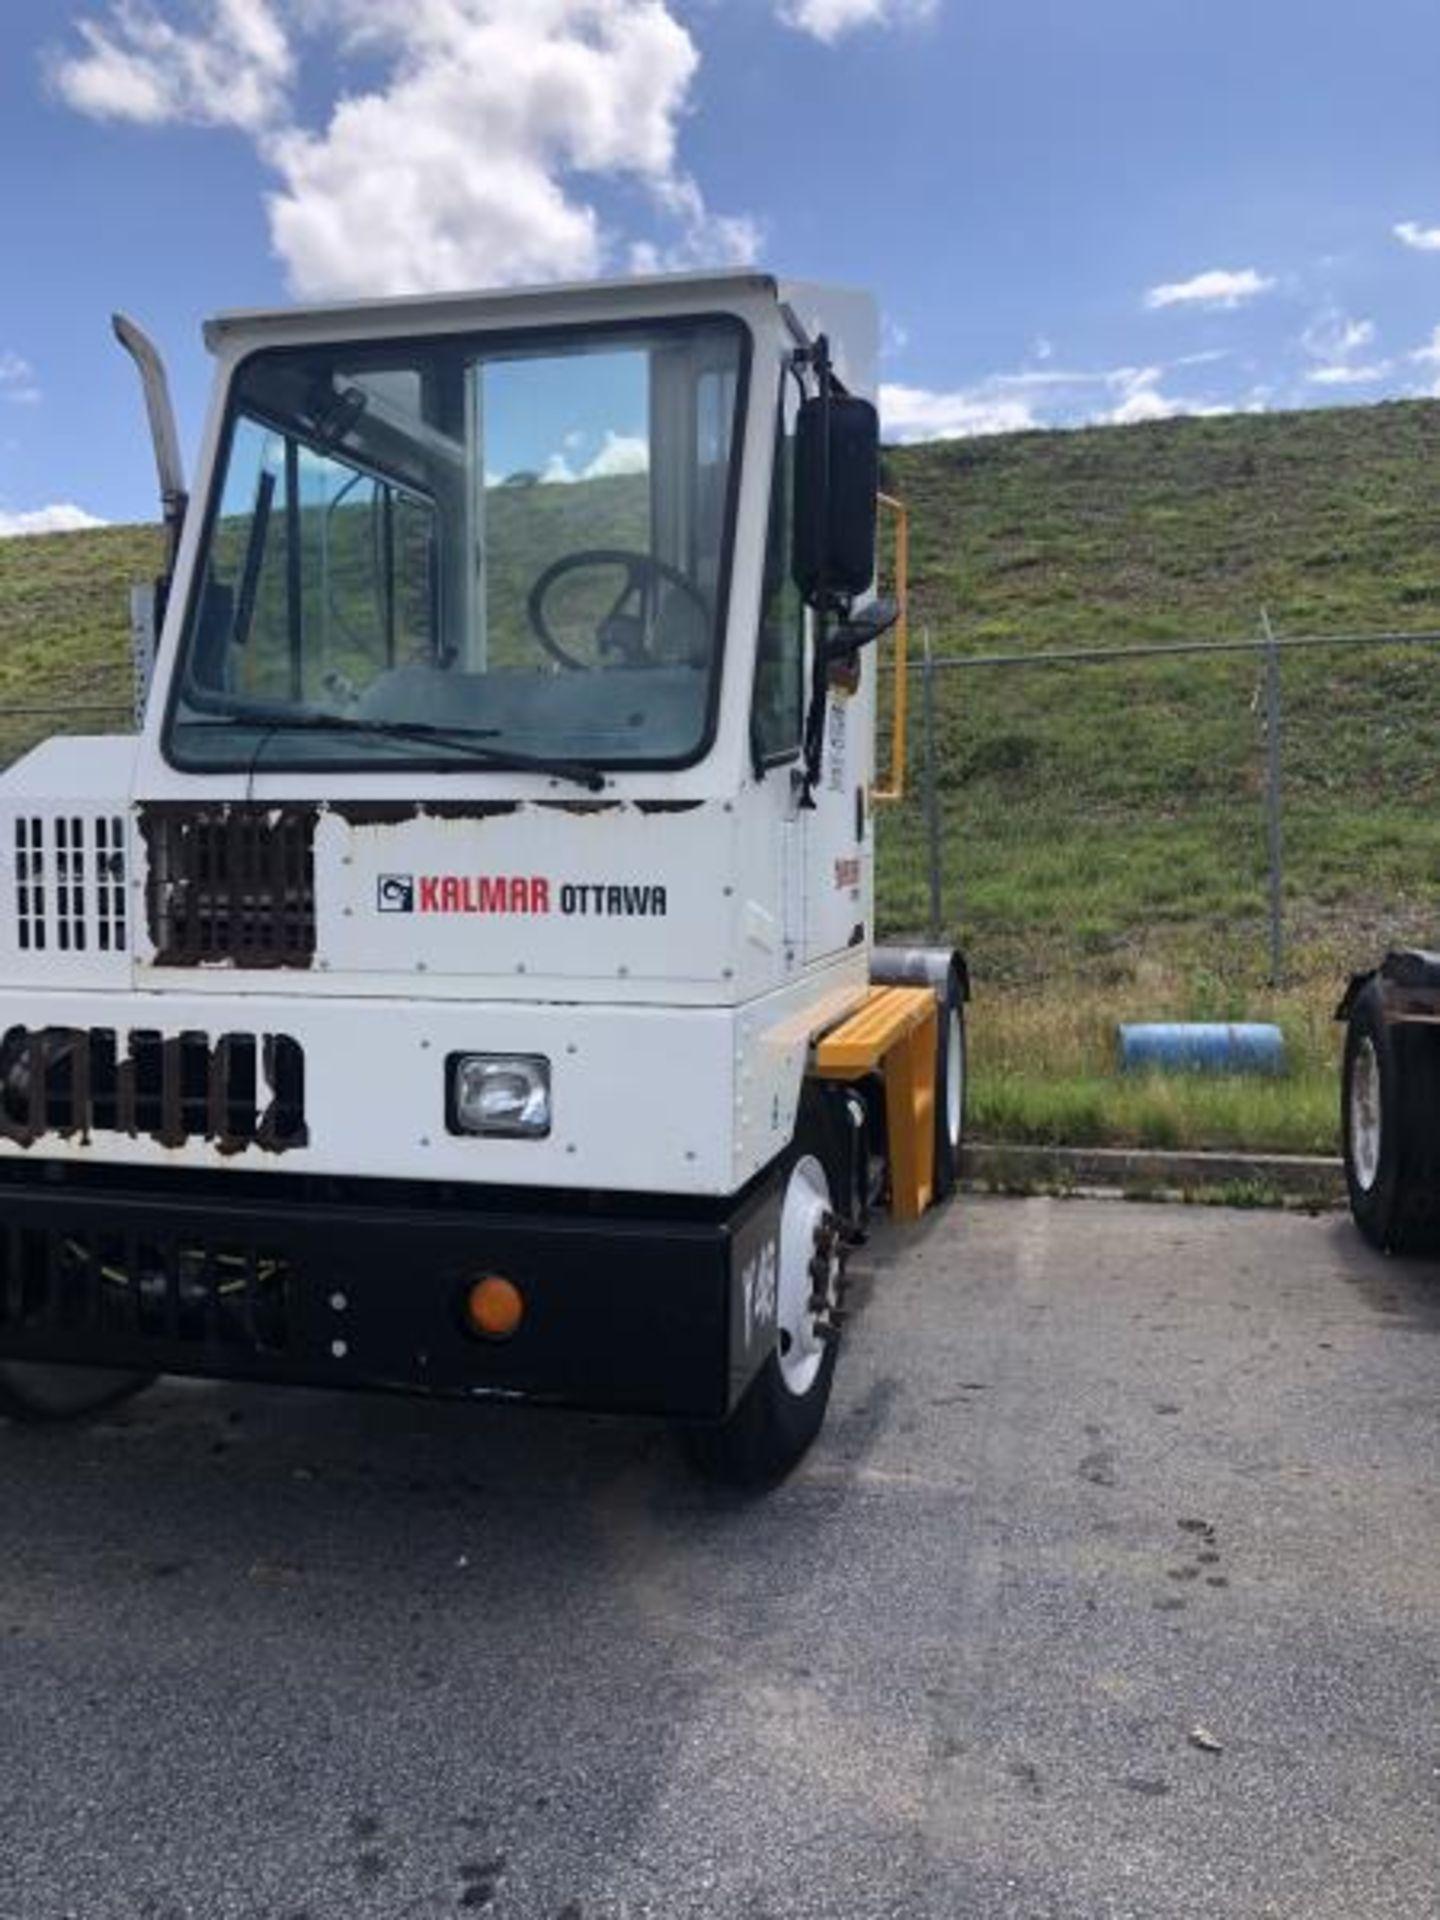 2015 Kalmar Ottawa 4x2 Yard Truck , SN: 338842 1,308.2 Hours, 937 Miles - Image 27 of 27